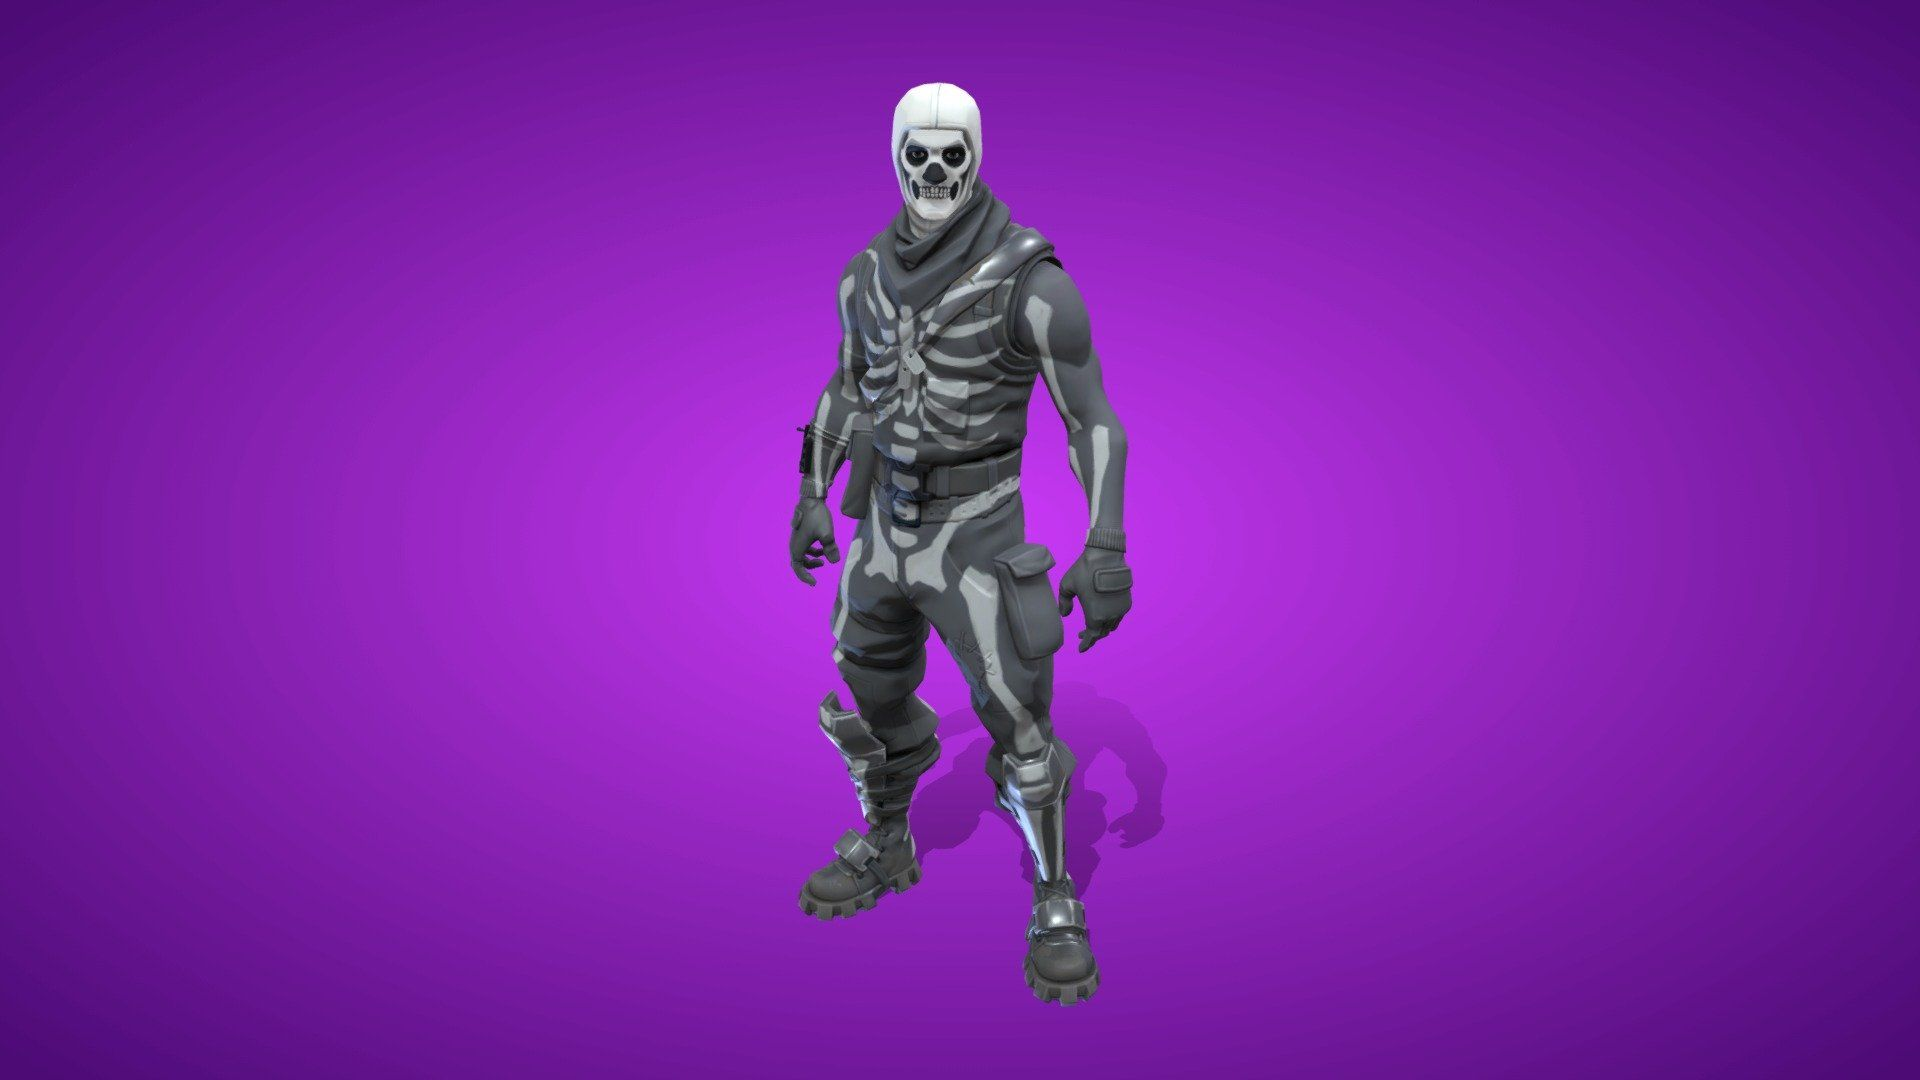 Skull Trooper Outfit 3d Model By Fortnite Skins Fortniteskins 7199a7a Sketchfab Fortnite Trooper Skin